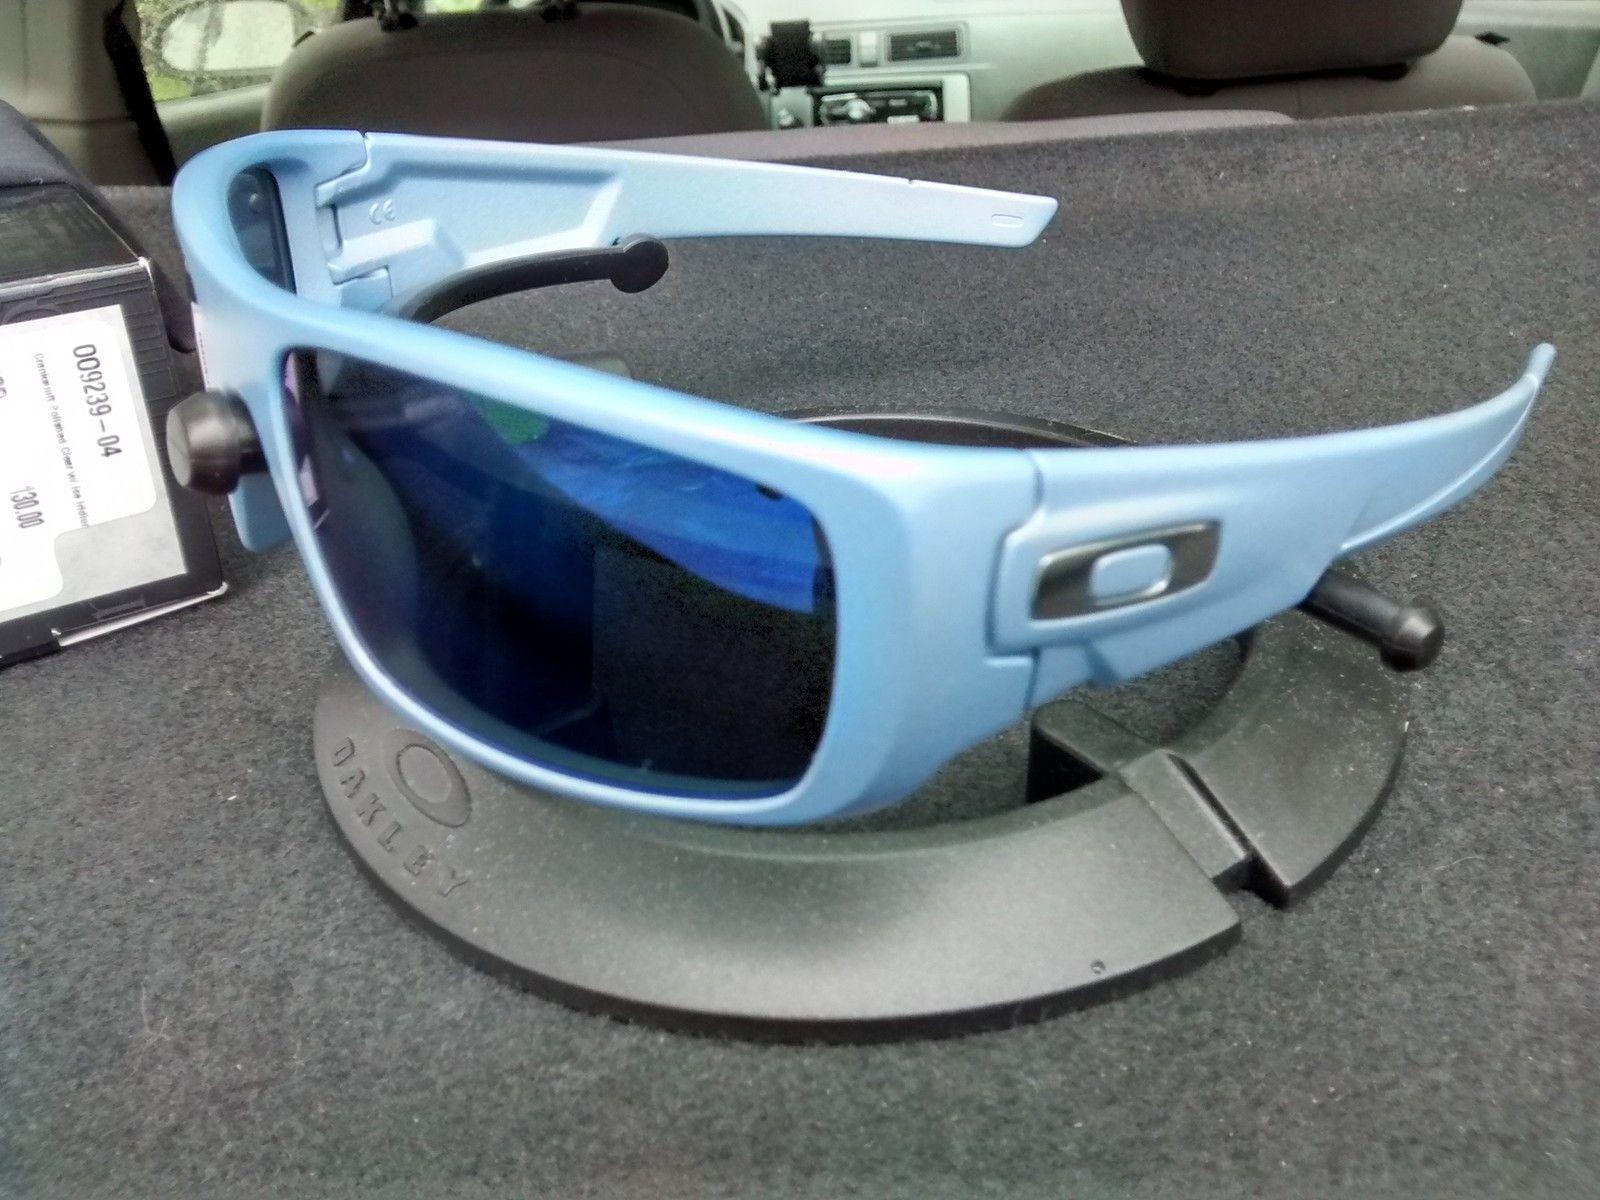 Cool As Ice! Custom Light Blue Metalic Cerakote Crankshaft - EKLX2Sf.jpg